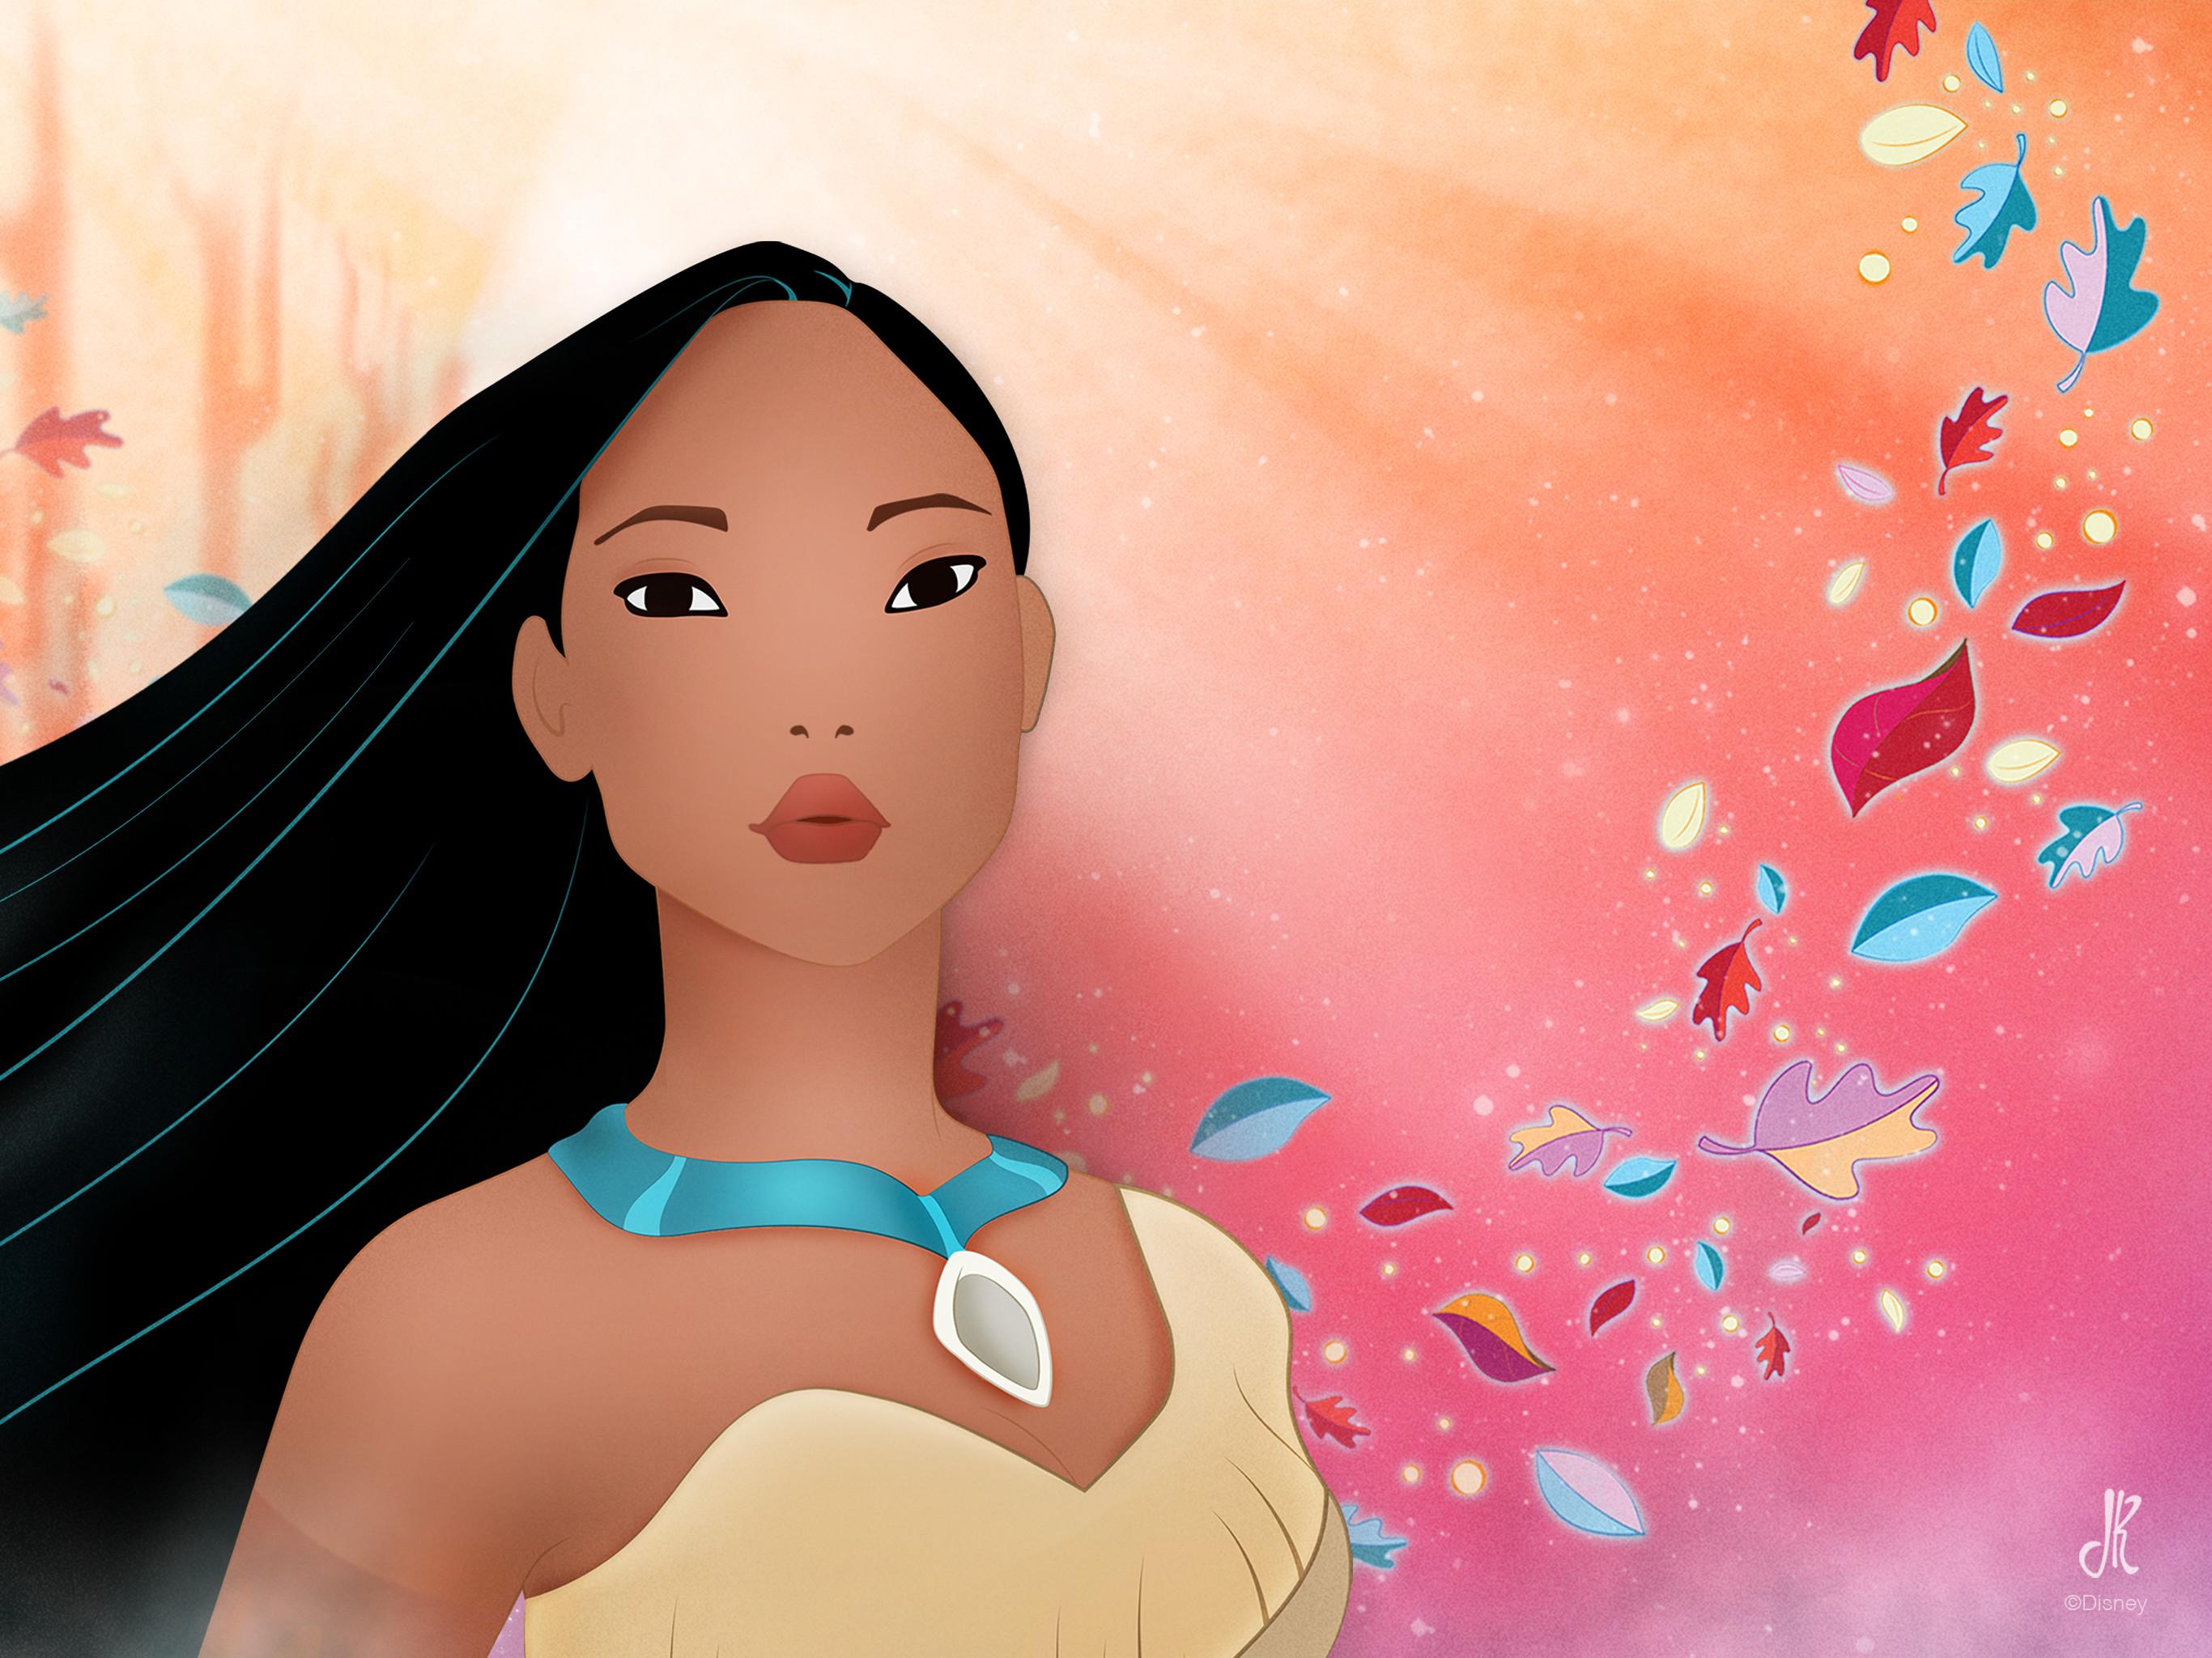 Res: 2732x2048, Anniversary of 'Pocahontas' Wallpaper